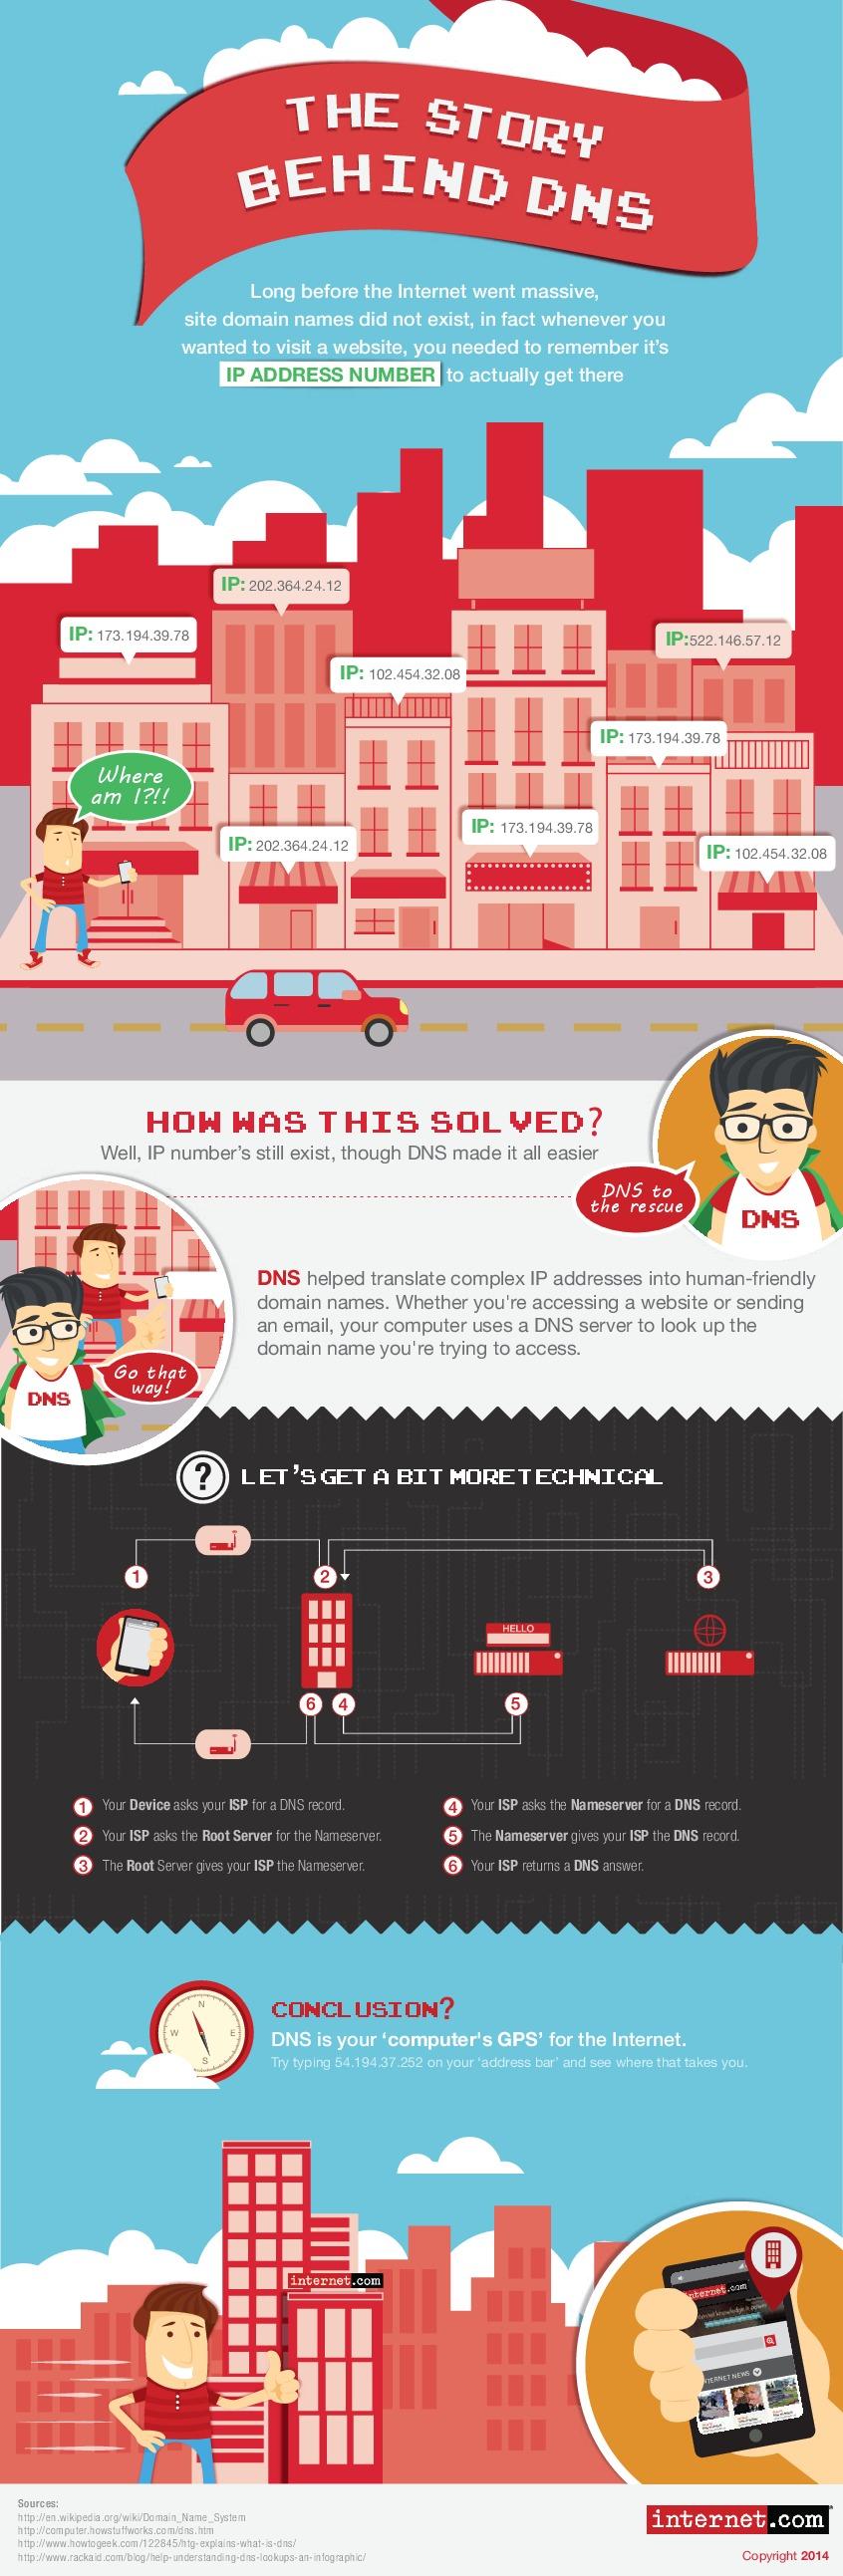 La historia detrás del DNS